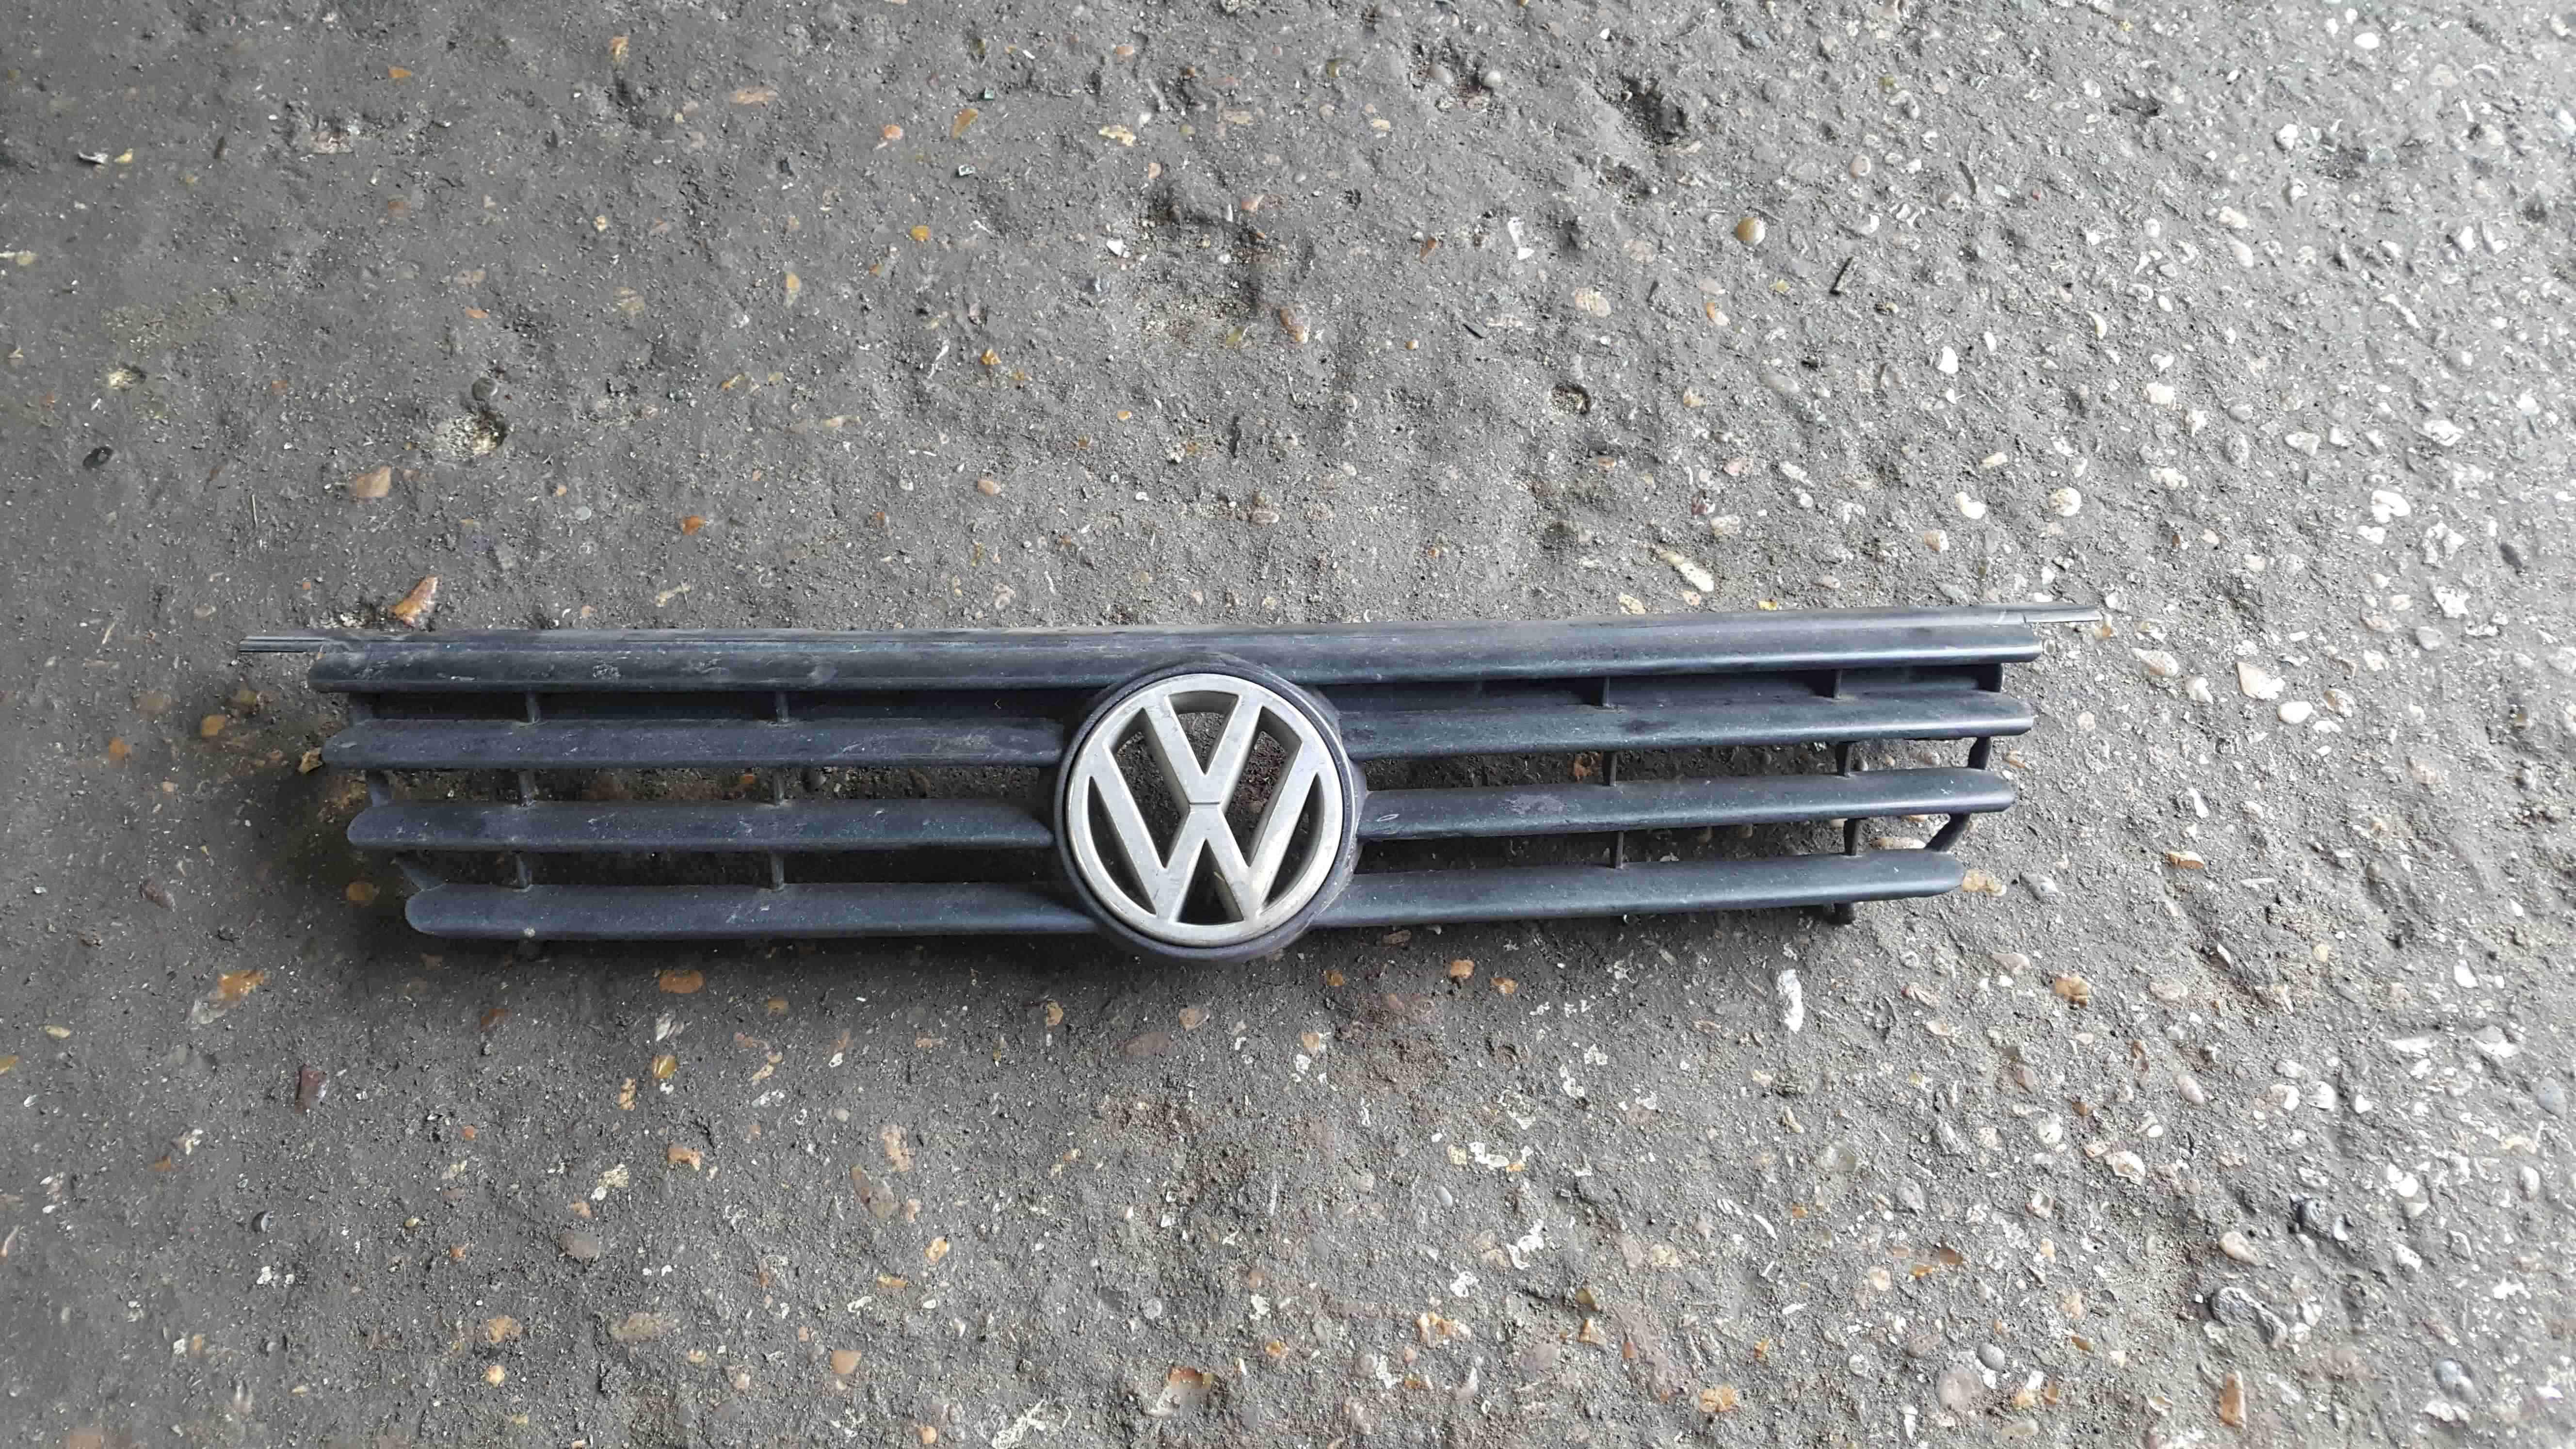 Volkswagen Polo 6N 1995-1999 Front Grill Bumper Insert Badge 6N0853653B